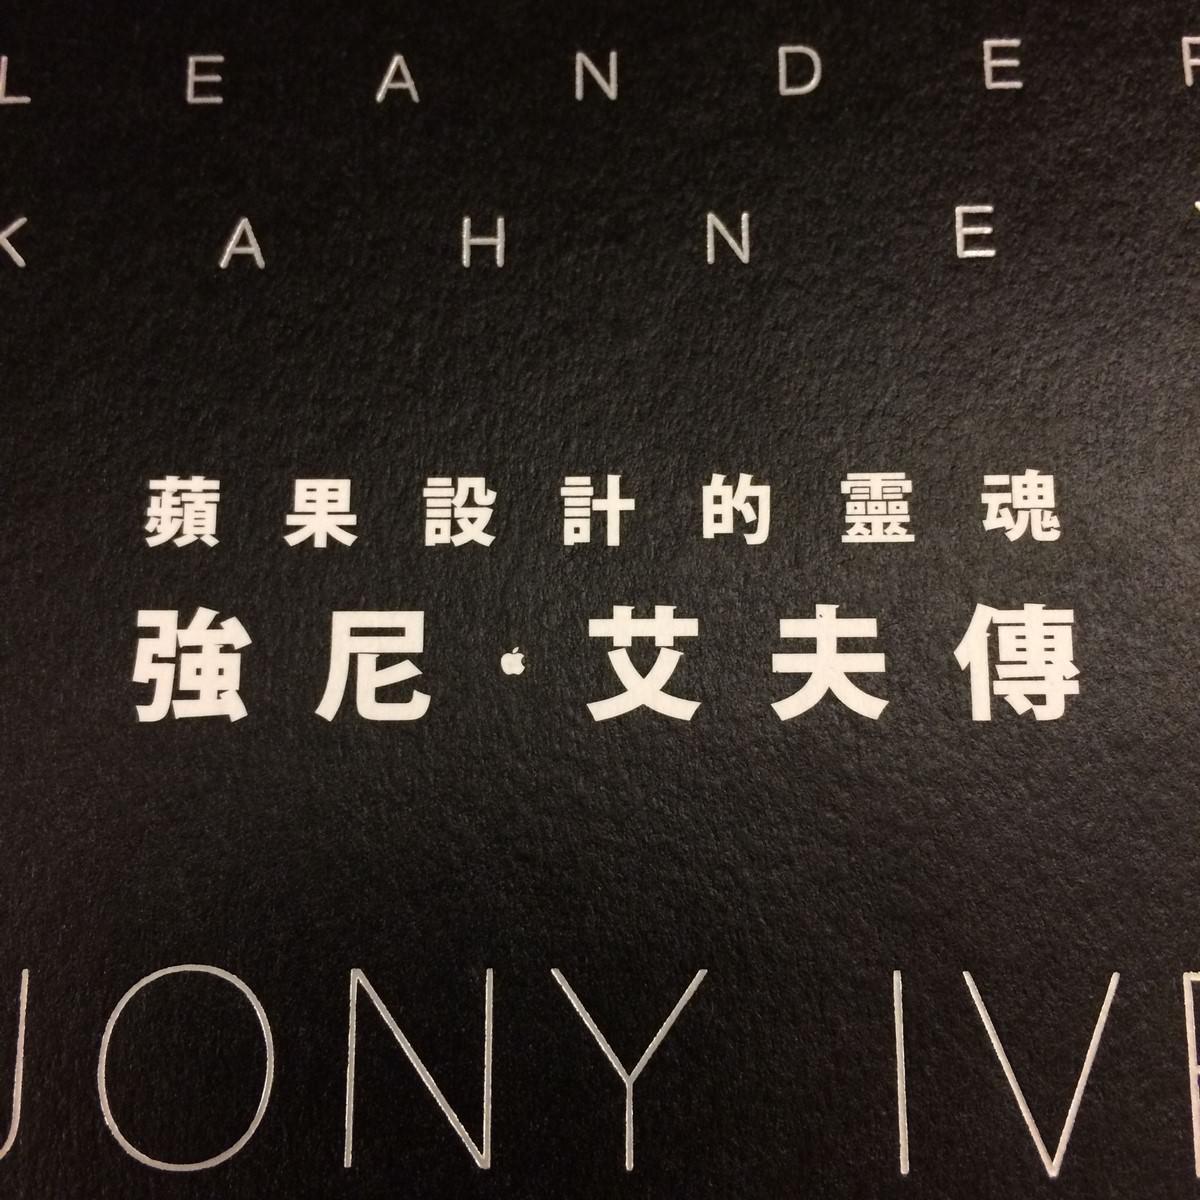 jony-ive-book-cover